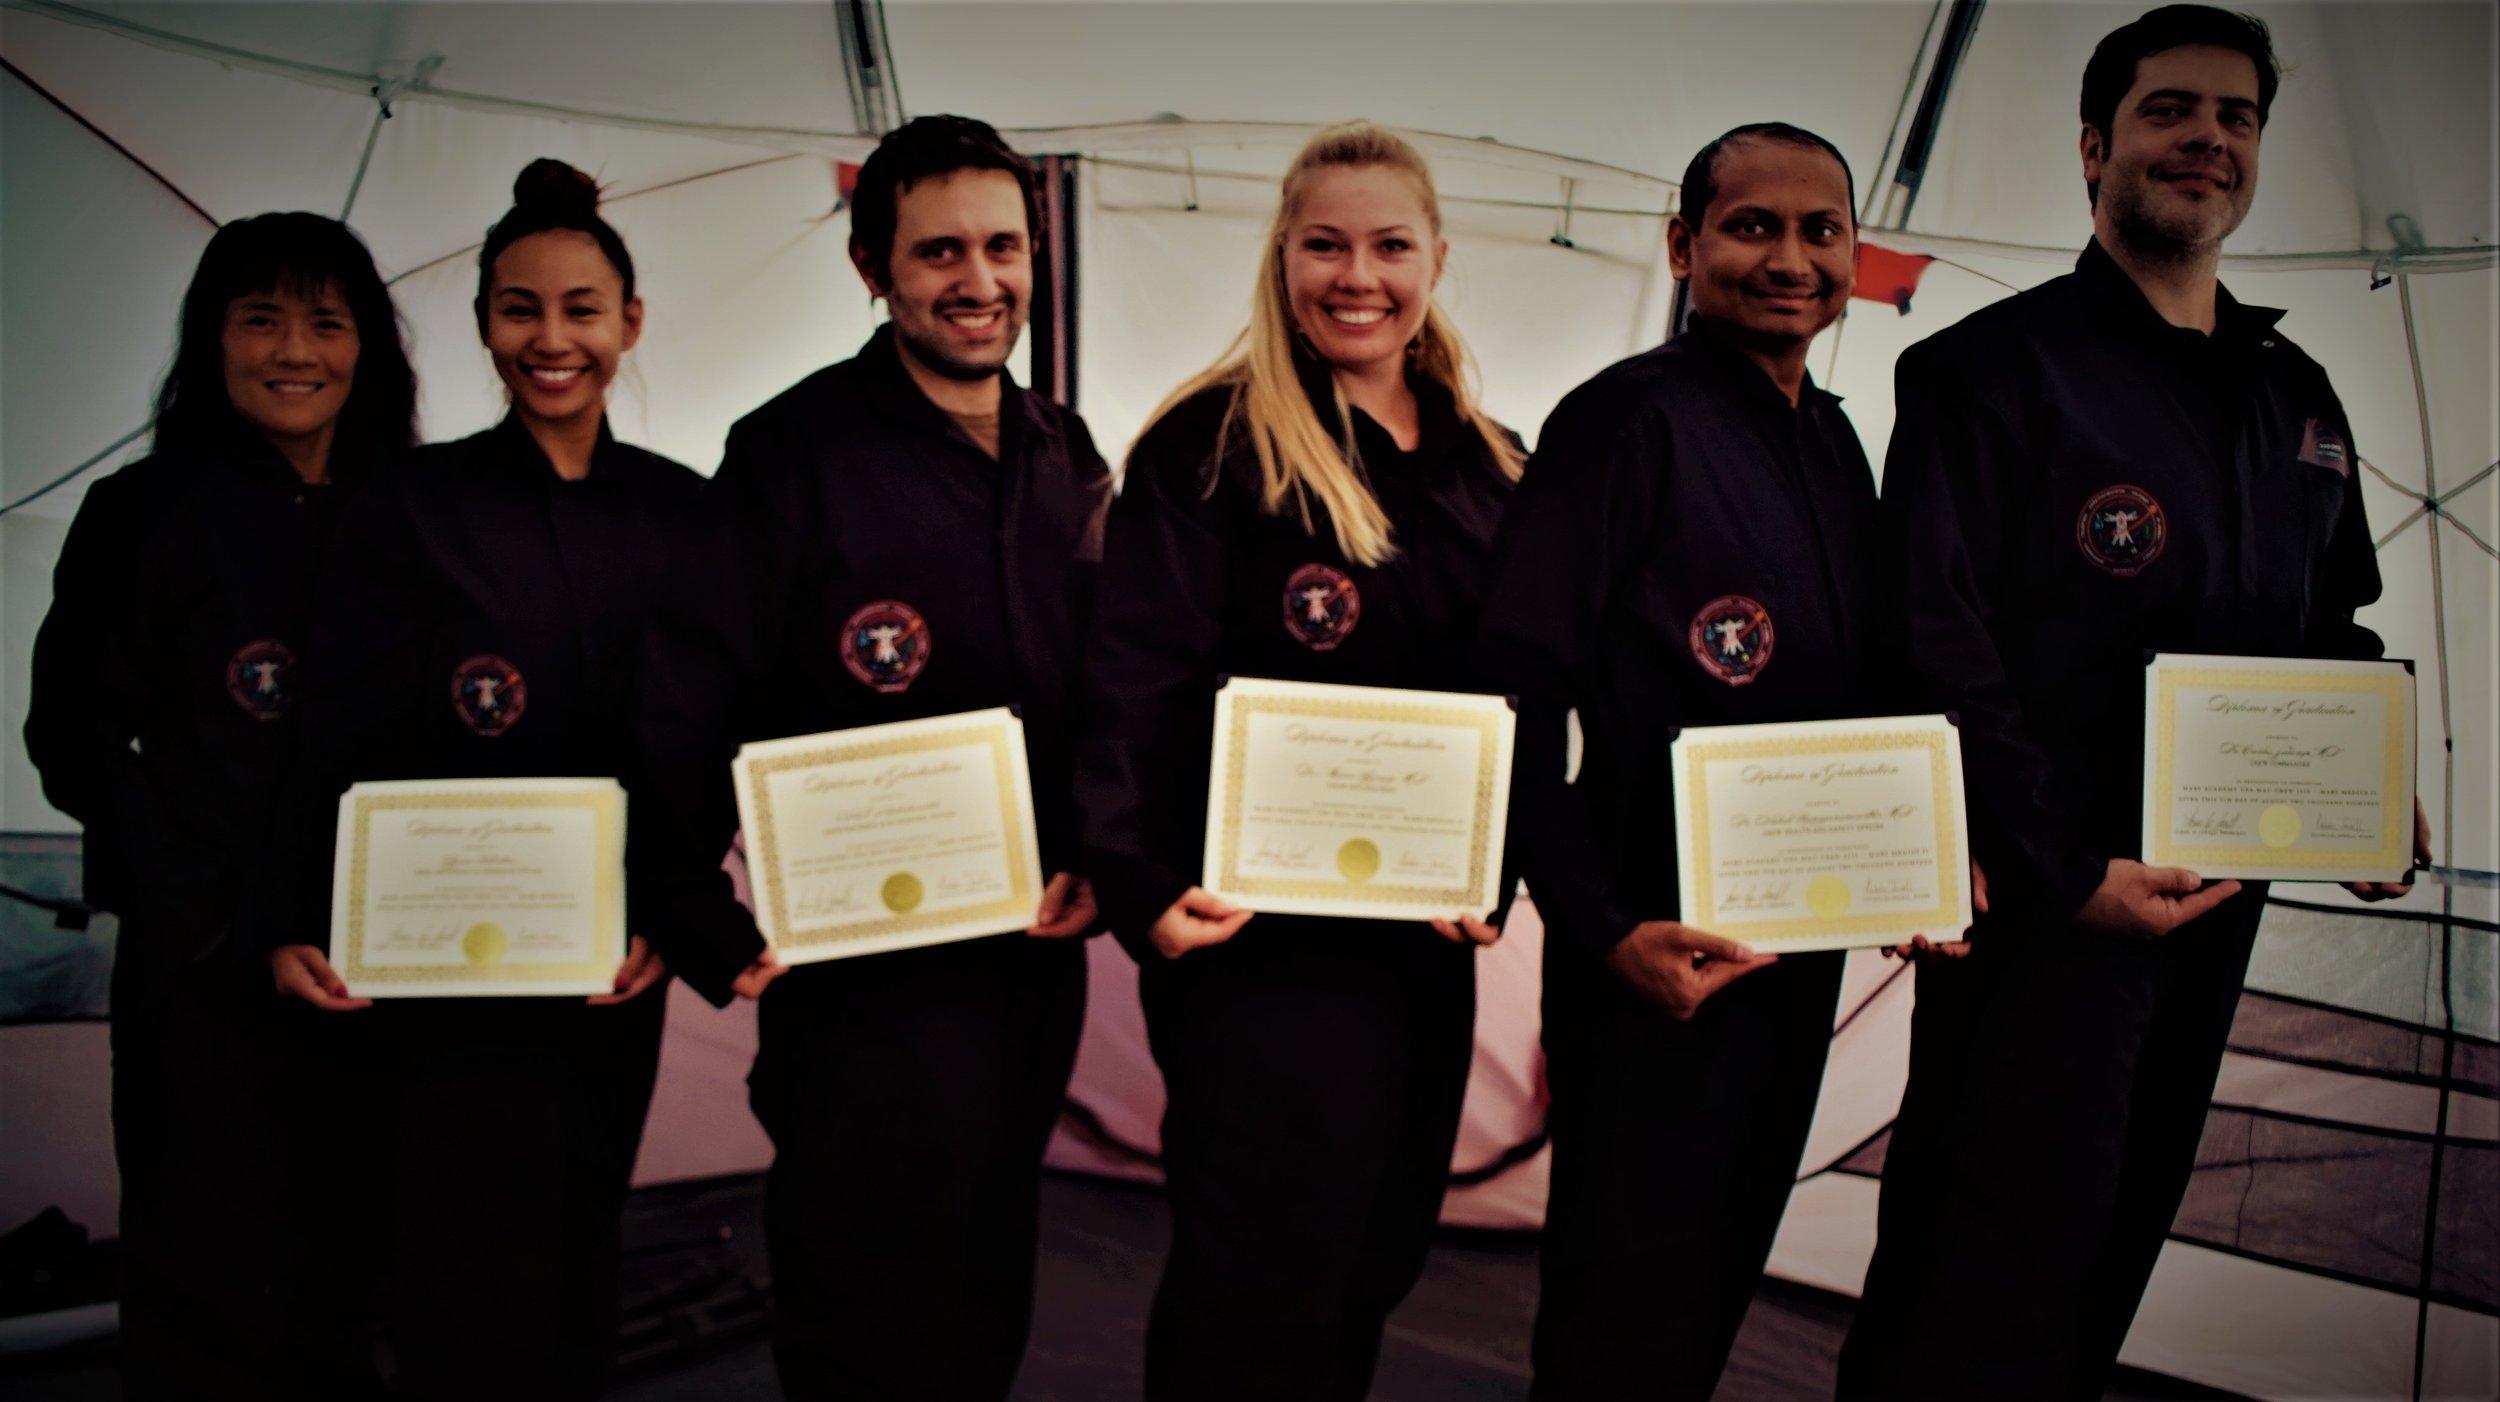 MAU Crew 1115 - Mars Medics II: Graduation Day at end of a successful training mission. Crew receiving their Graduation Diplomas